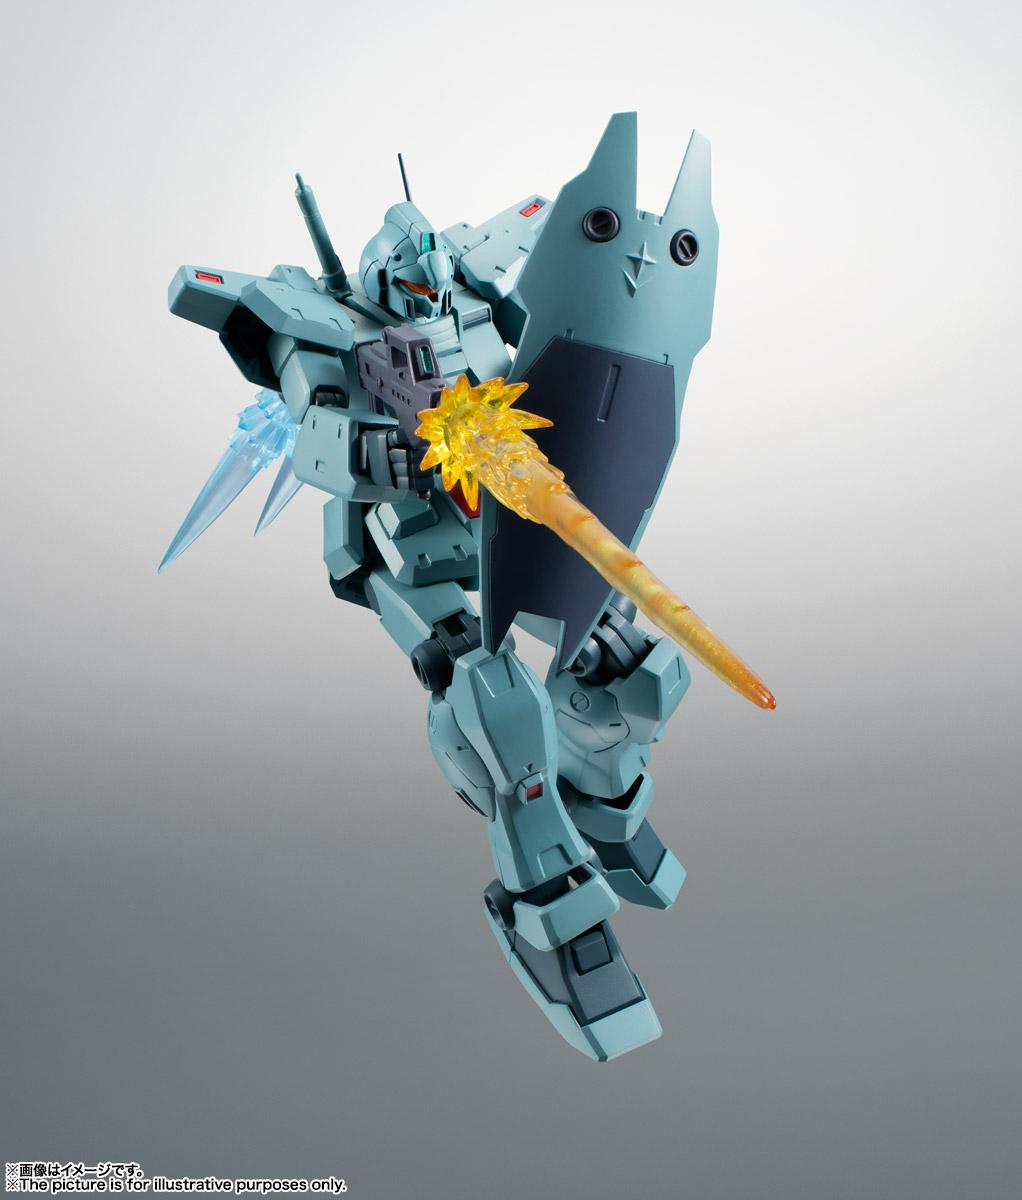 ROBOT魂〈SIDE MS〉『RGM-79N ジム・カスタム ver. A.N.I.M.E.』ガンダム0083 可動フィギュア-004